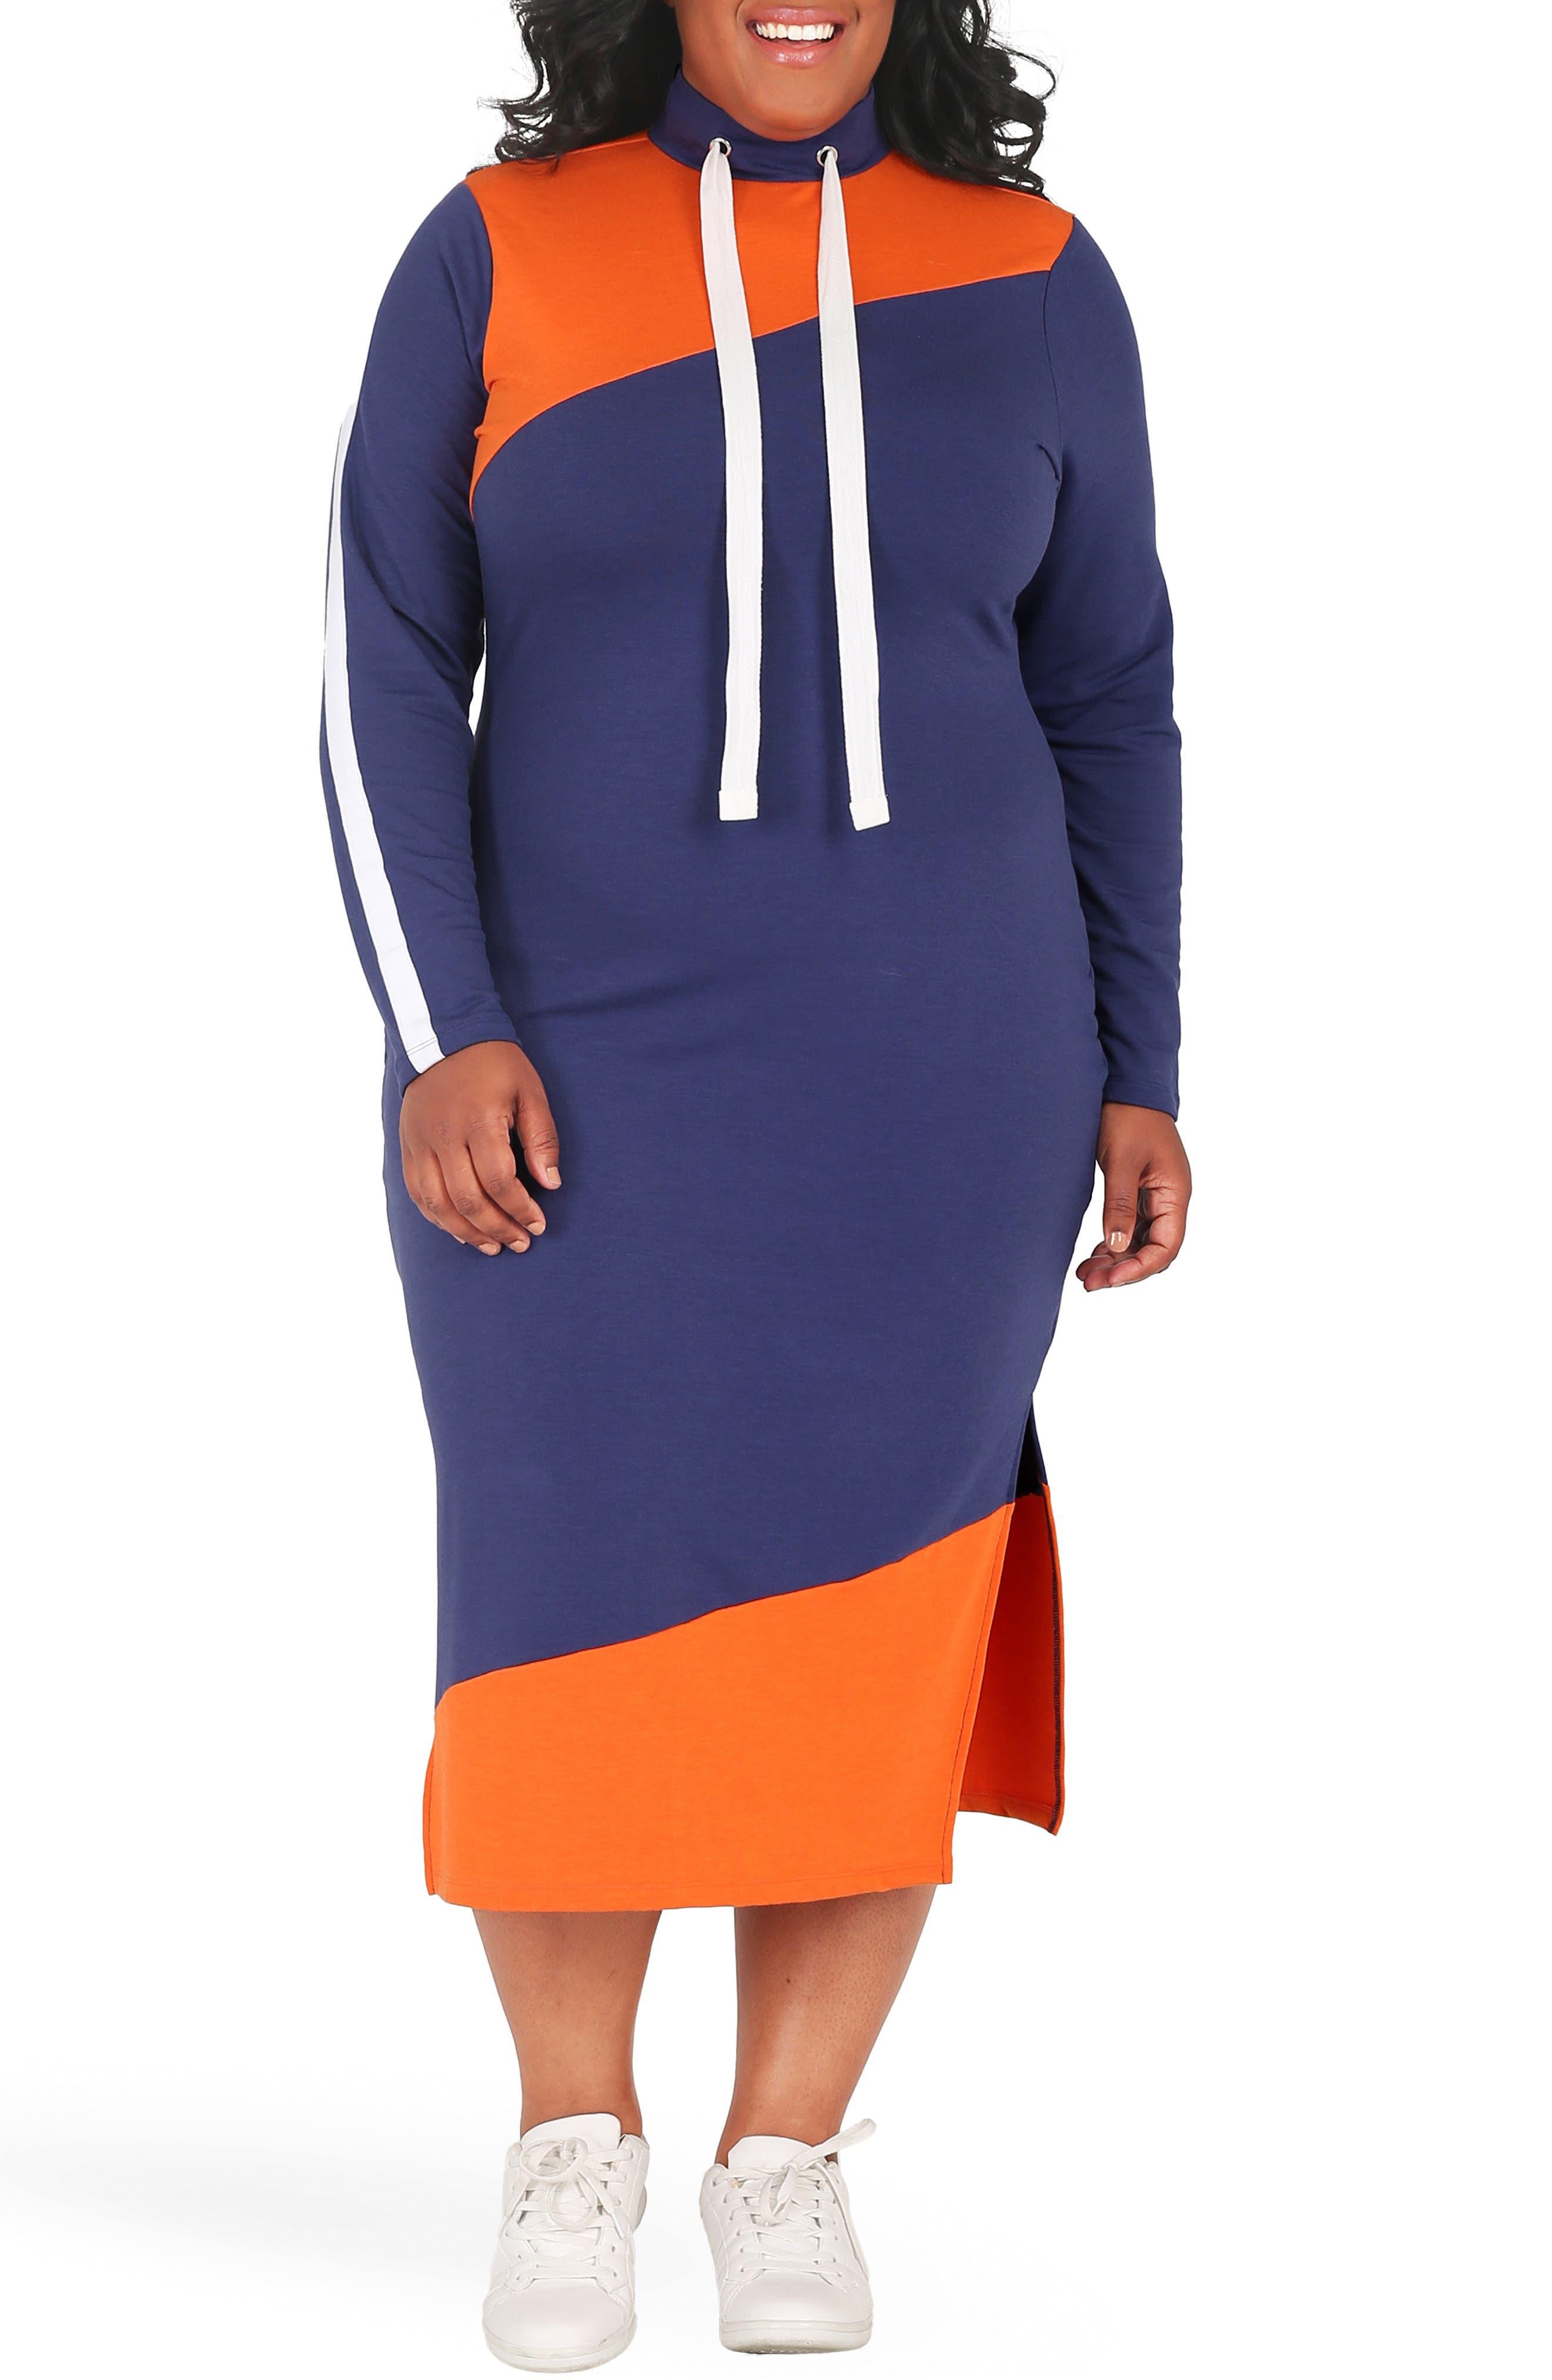 POETIC JUSTICE Wanda Colorblock Midi Dress, Main, color, NAVY